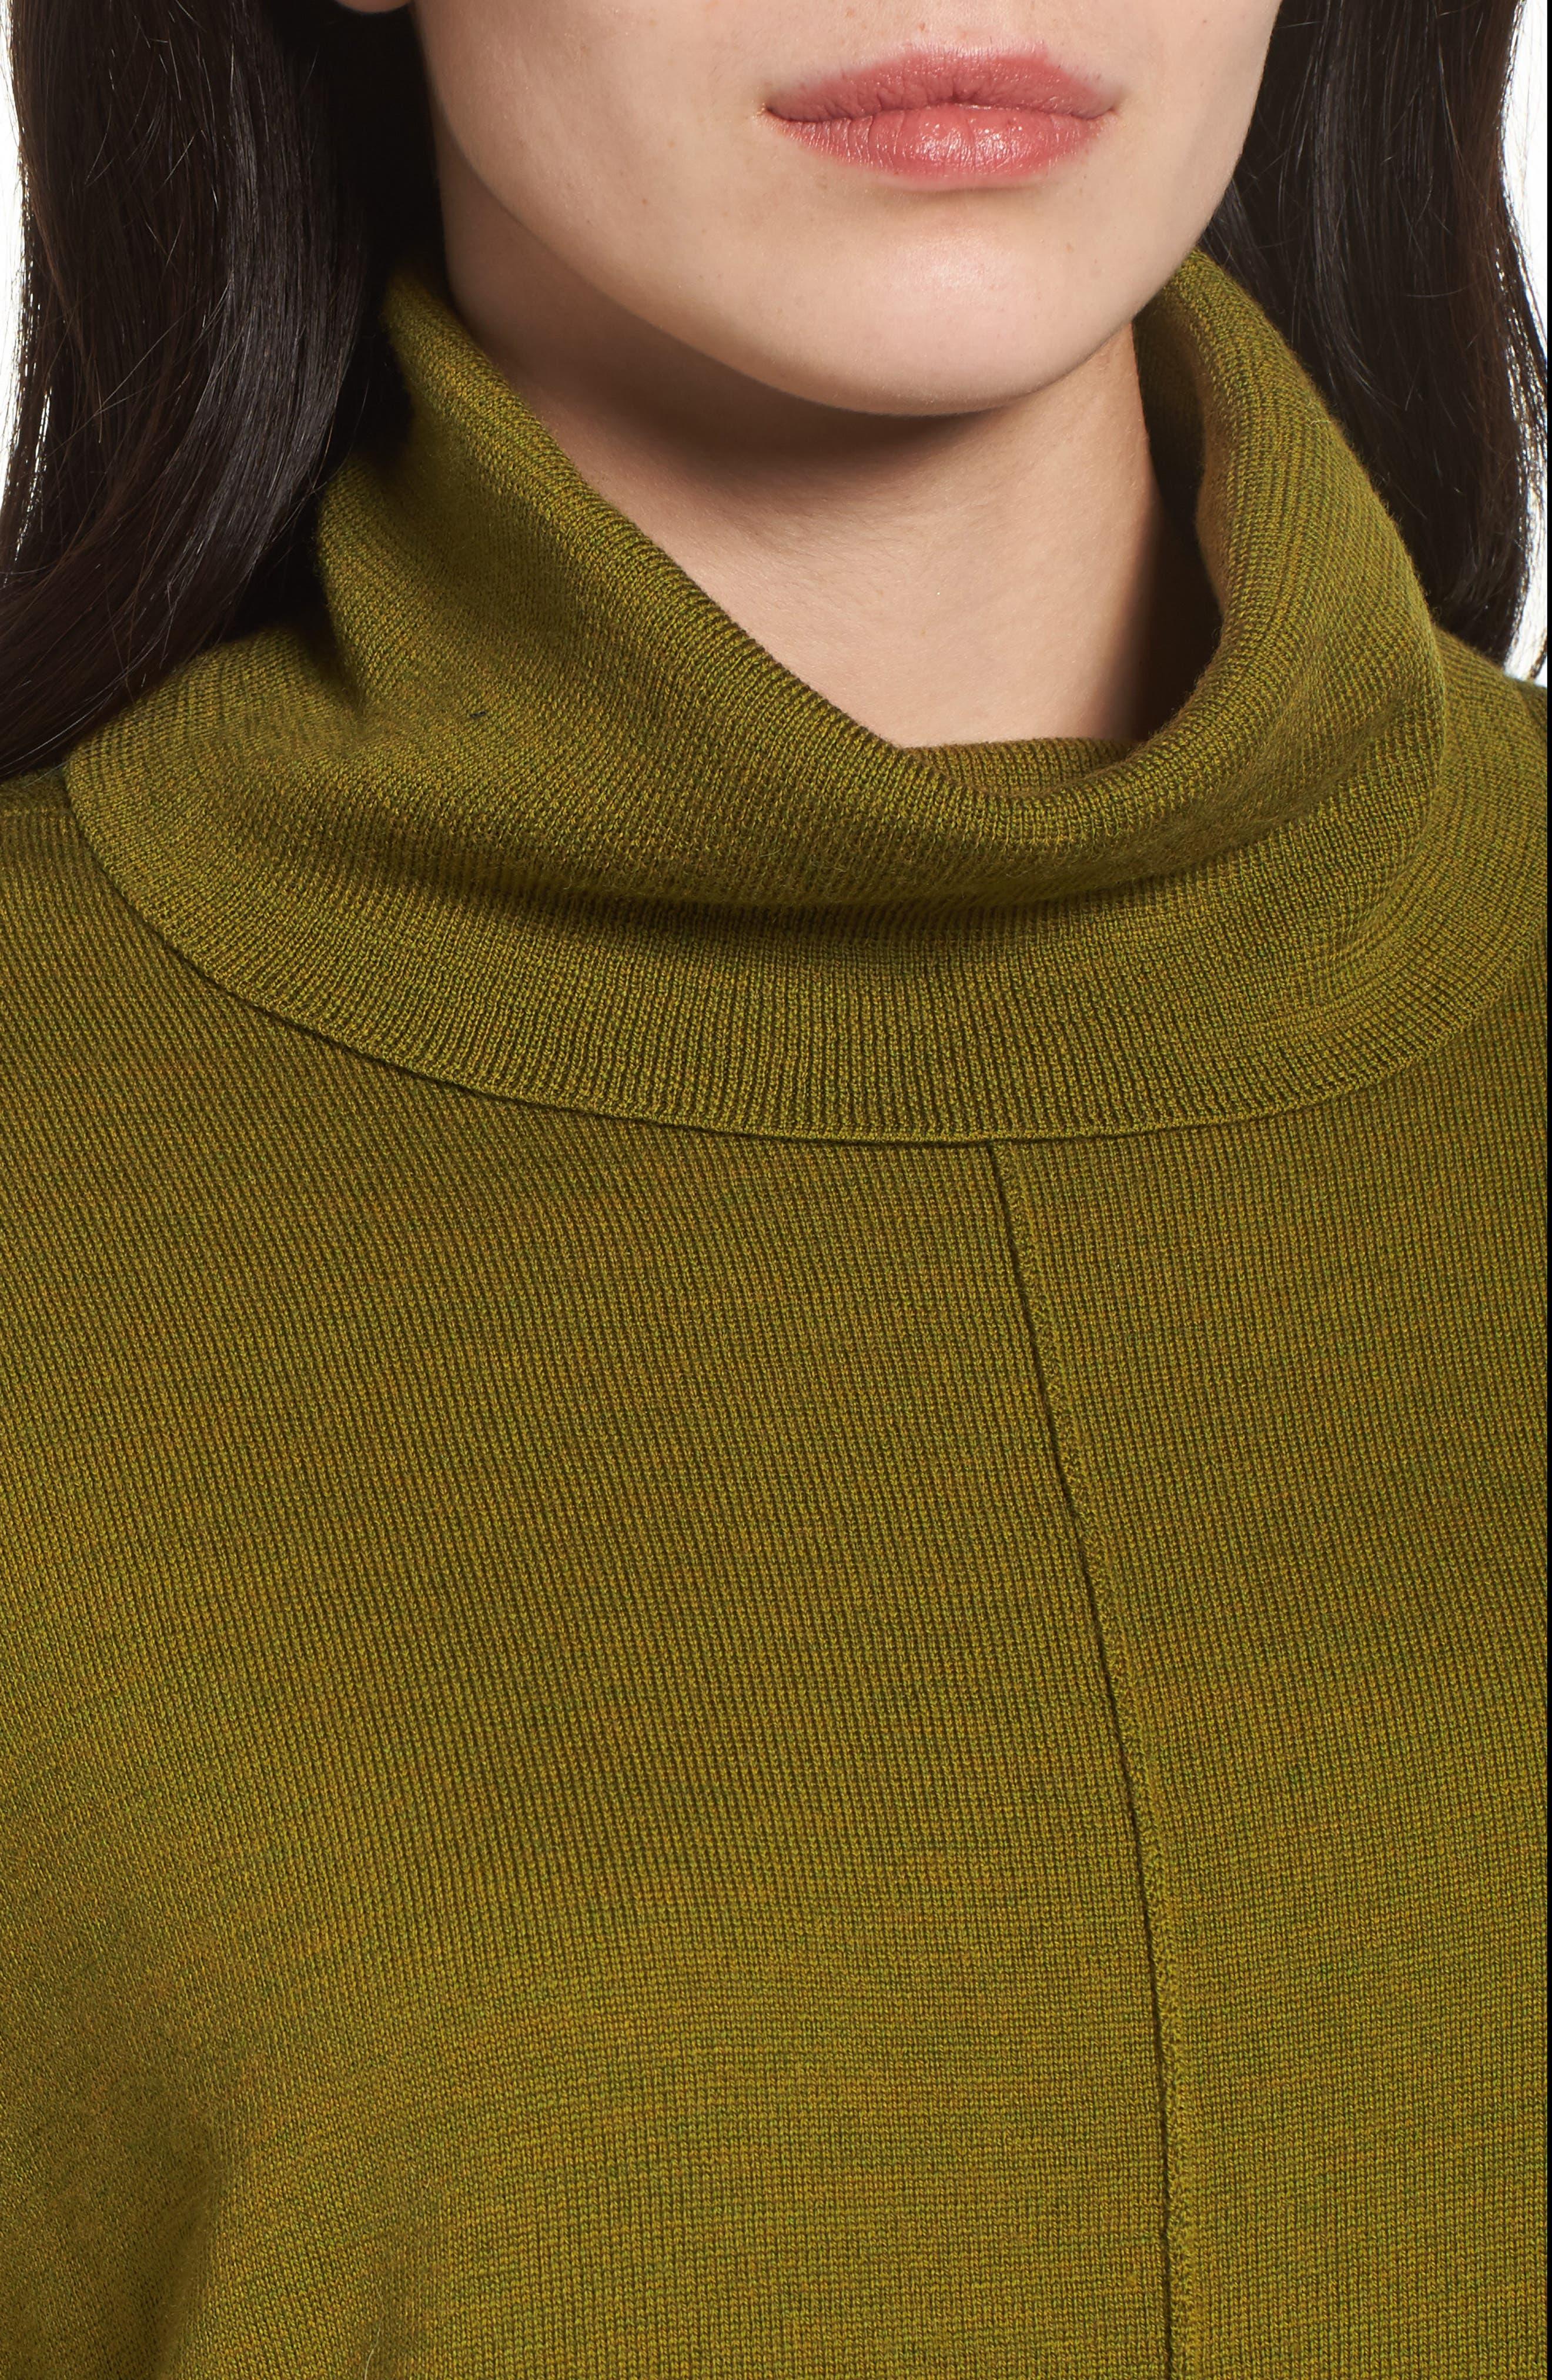 Merino Wool Boxy Turtleneck Sweater,                             Alternate thumbnail 20, color,